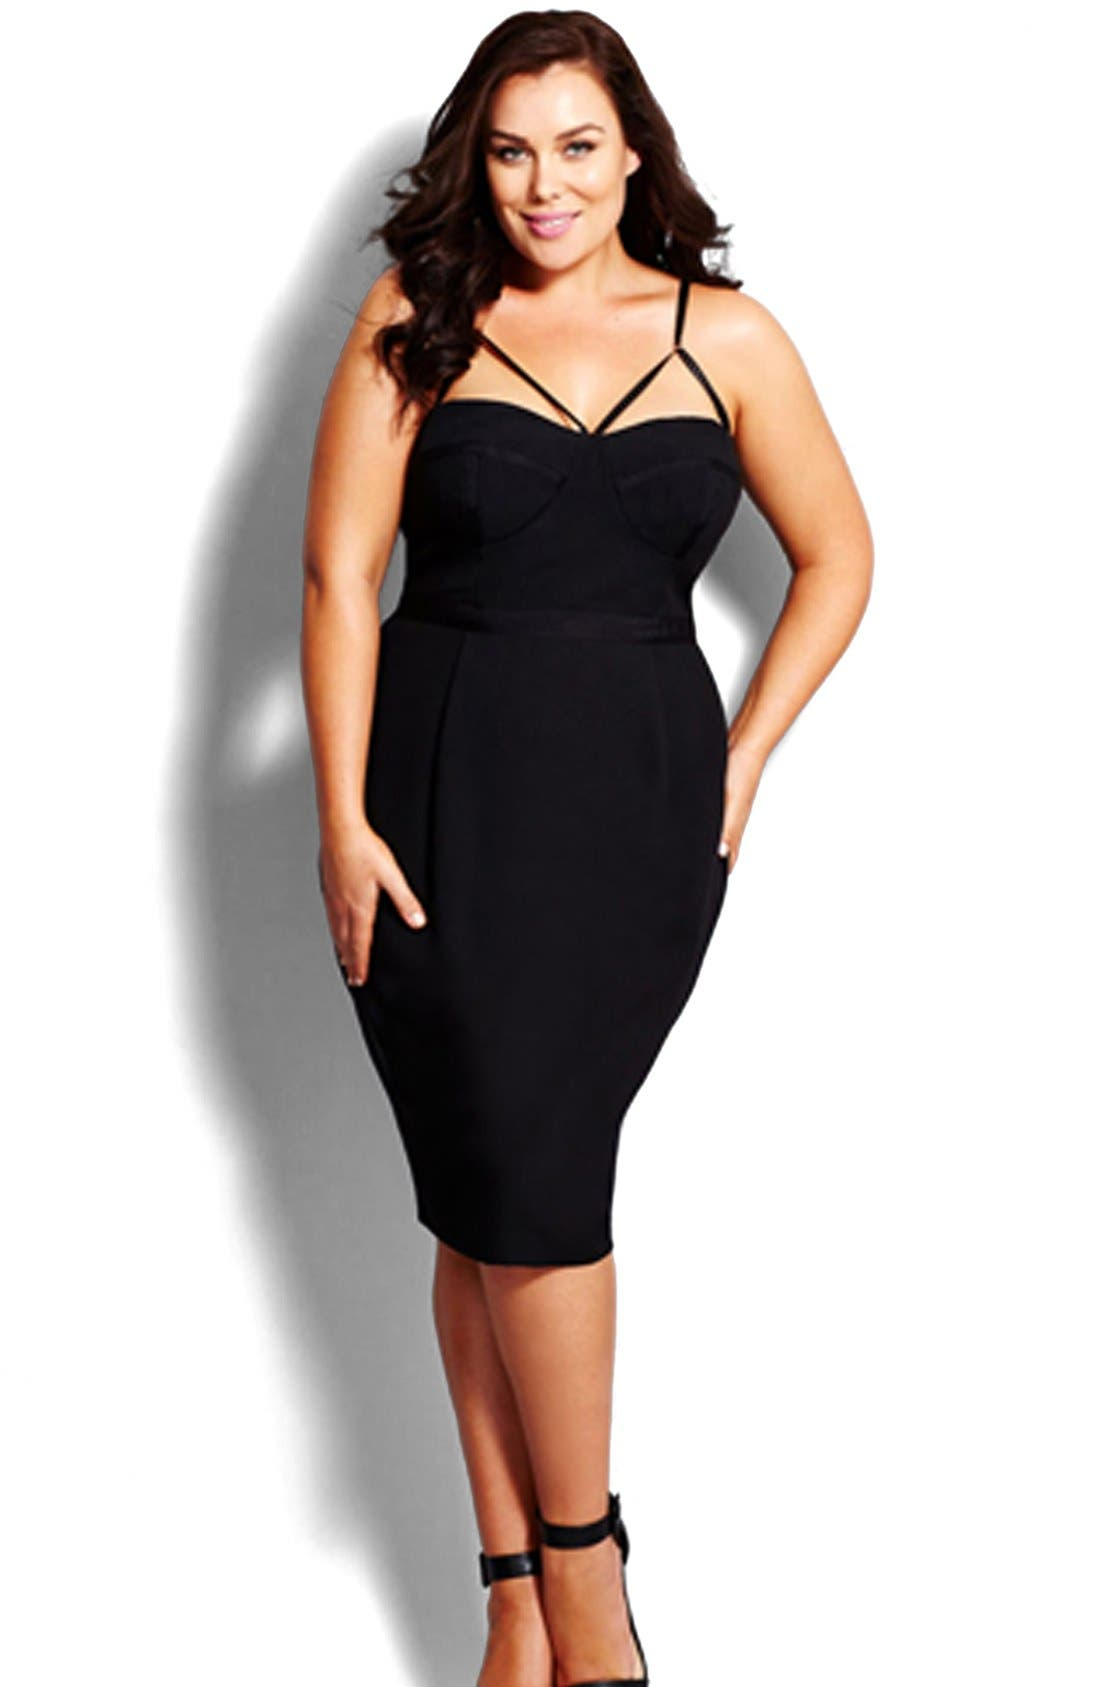 Black dress 16 25